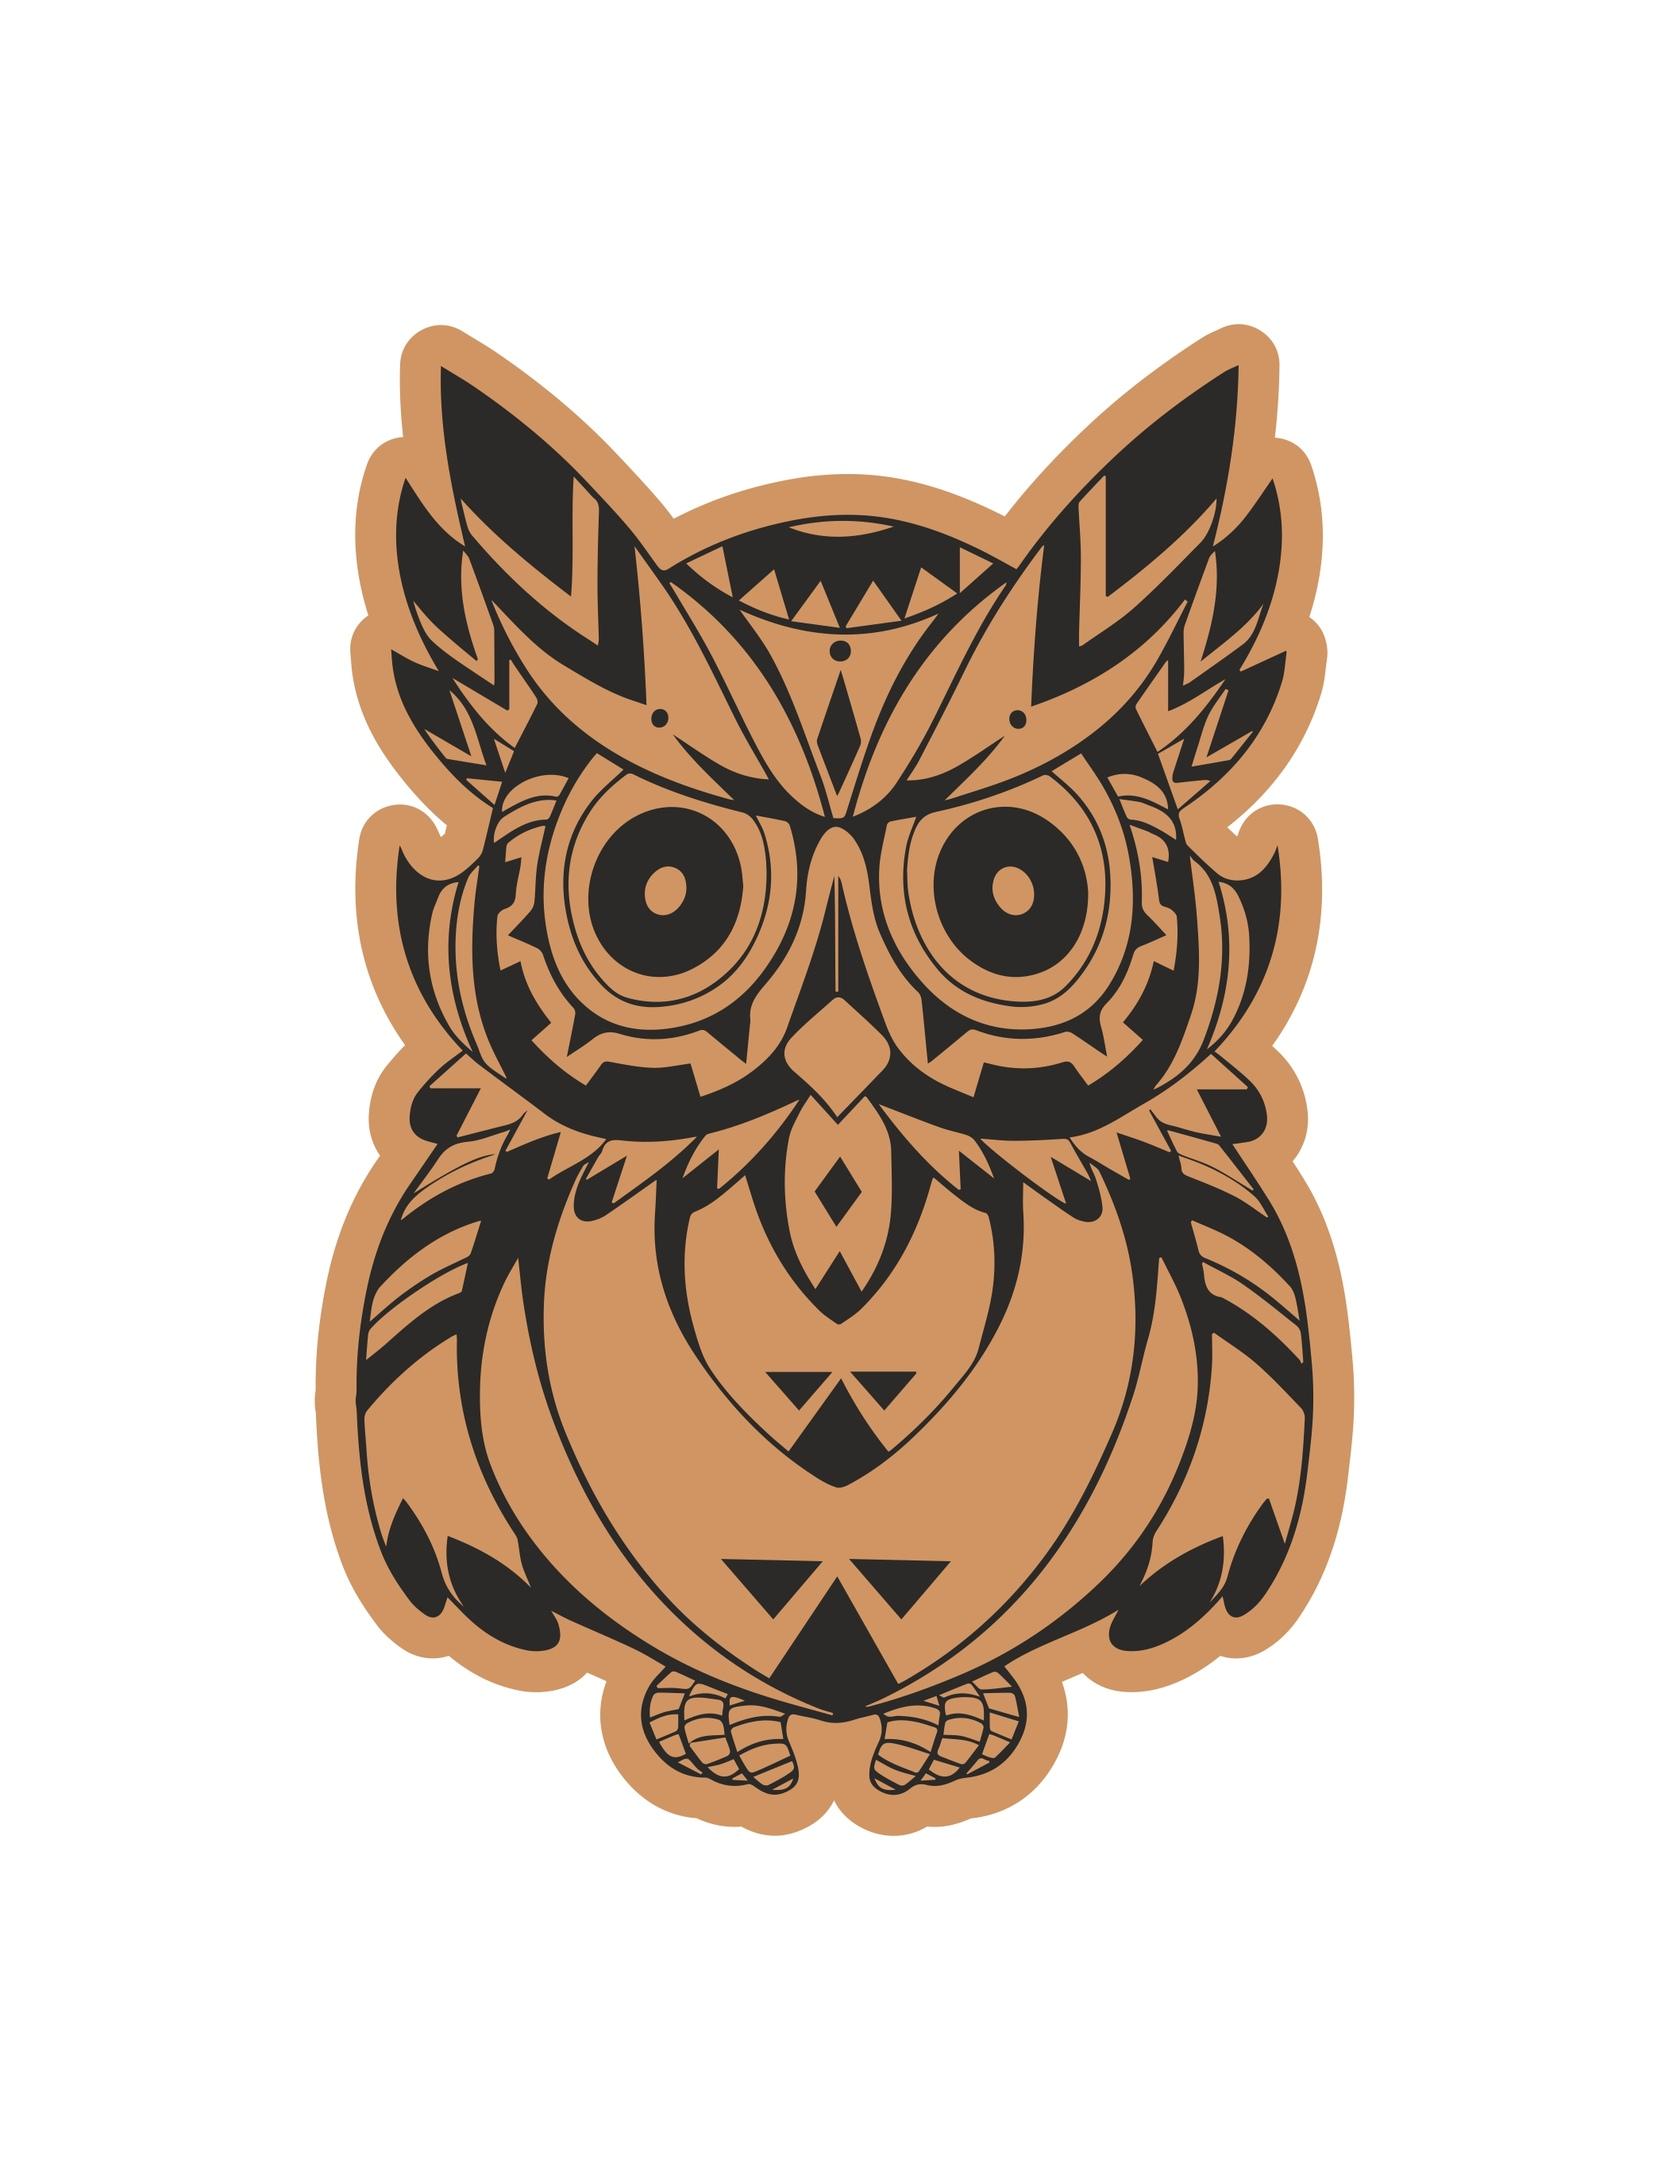 Cute Owl Laser Cut Engraving Template Free Vector